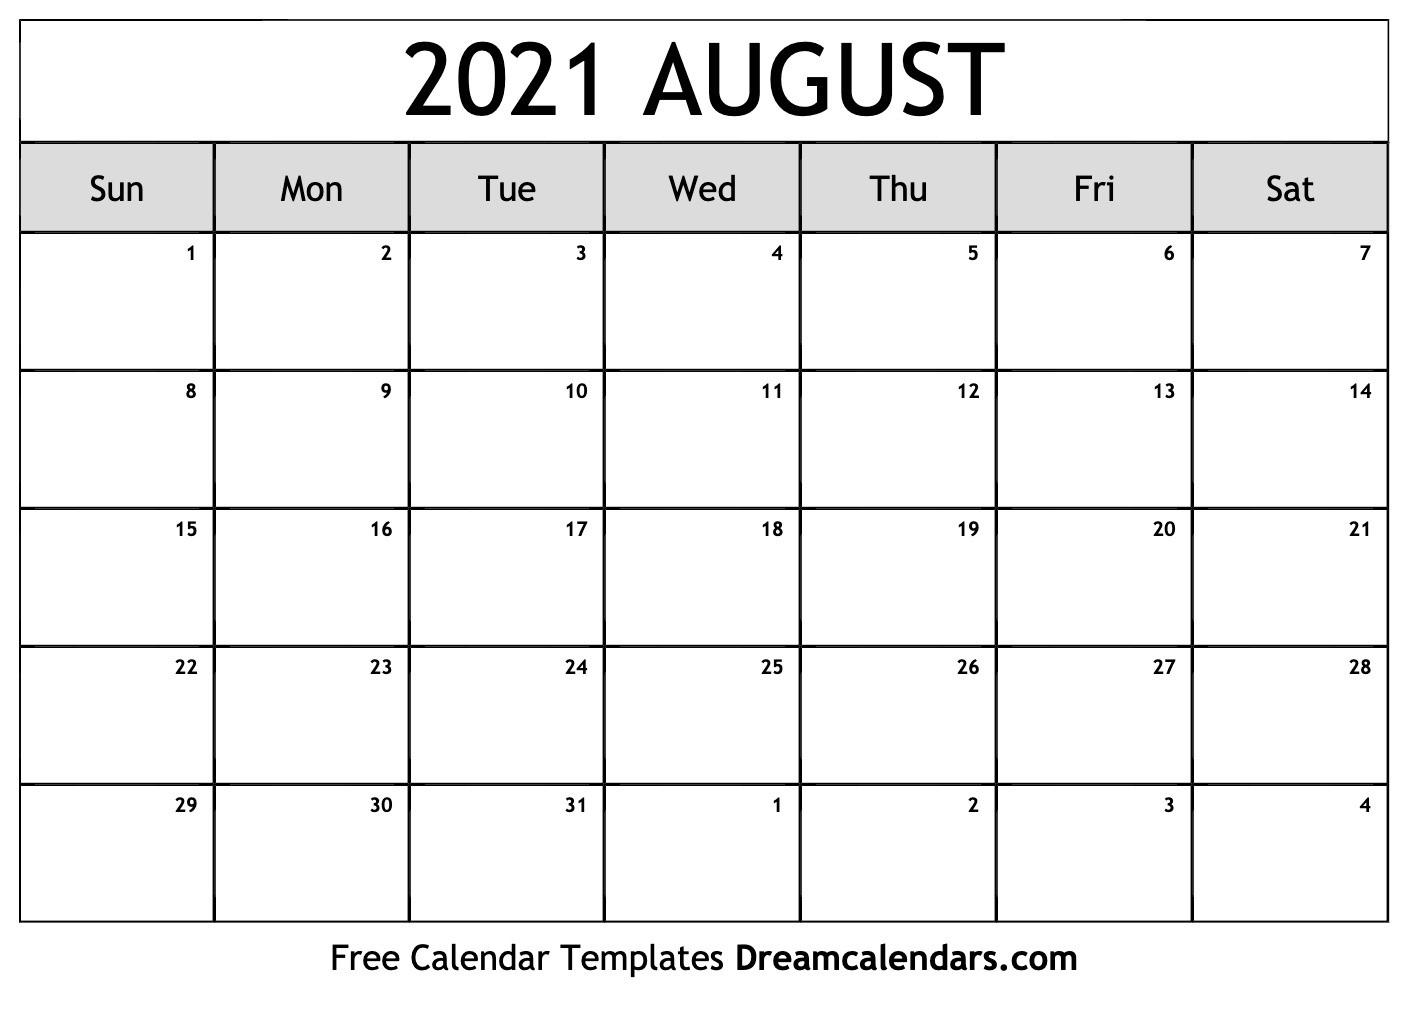 August 2021 Calendar | Free Blank Printable Templates  Calendar 2021 August To December